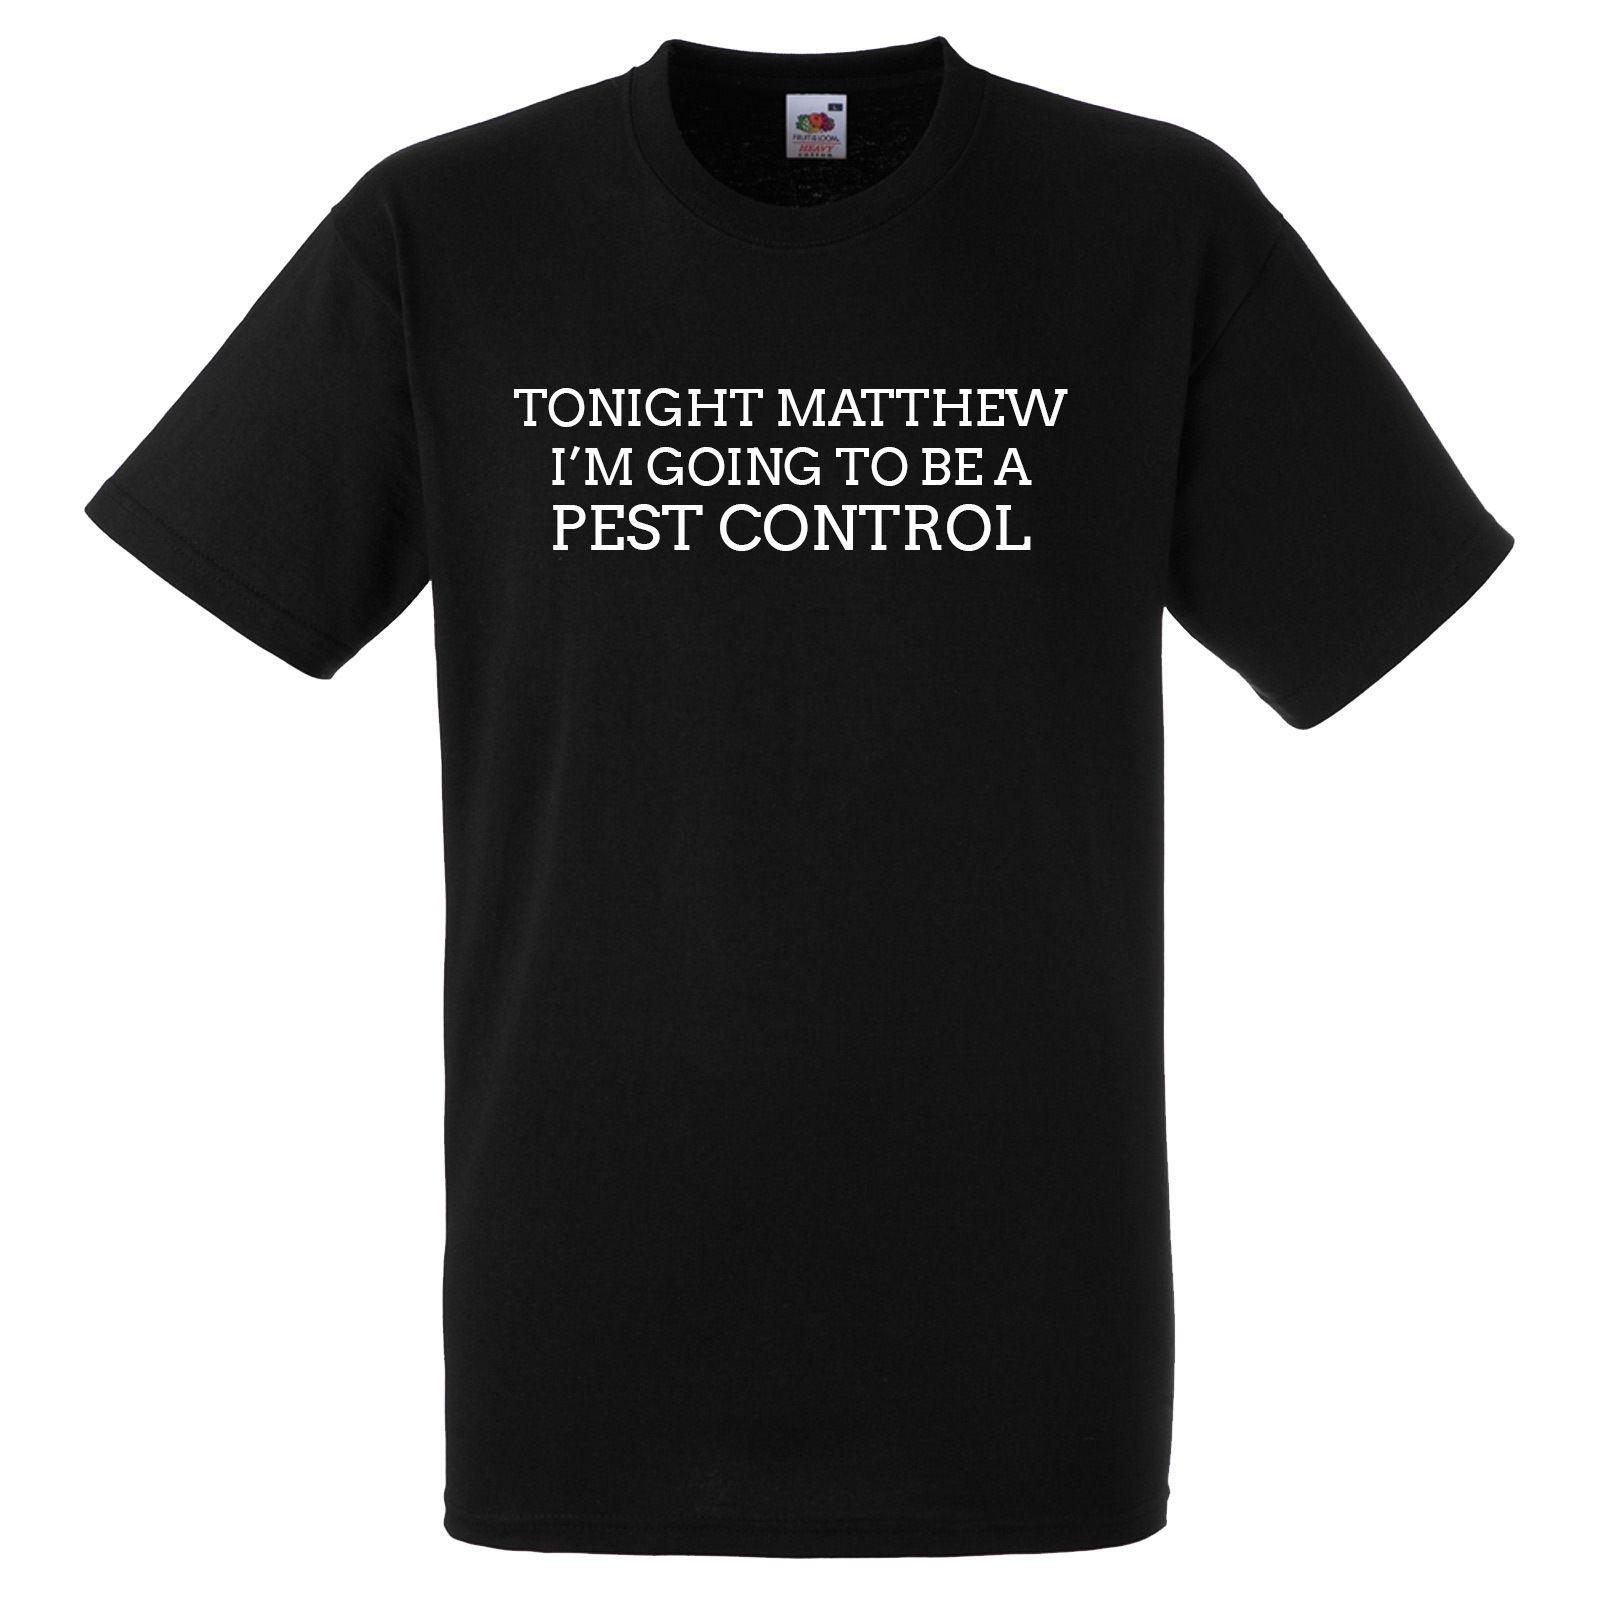 397af03c TONIGHT MATTHEW IM GOING TO BE A PEST CONTROL BLACK T SHIRT Cool T Shirt  Companies 24 Hour T Shirt From Spreadshirtinc, $11.01| DHgate.Com